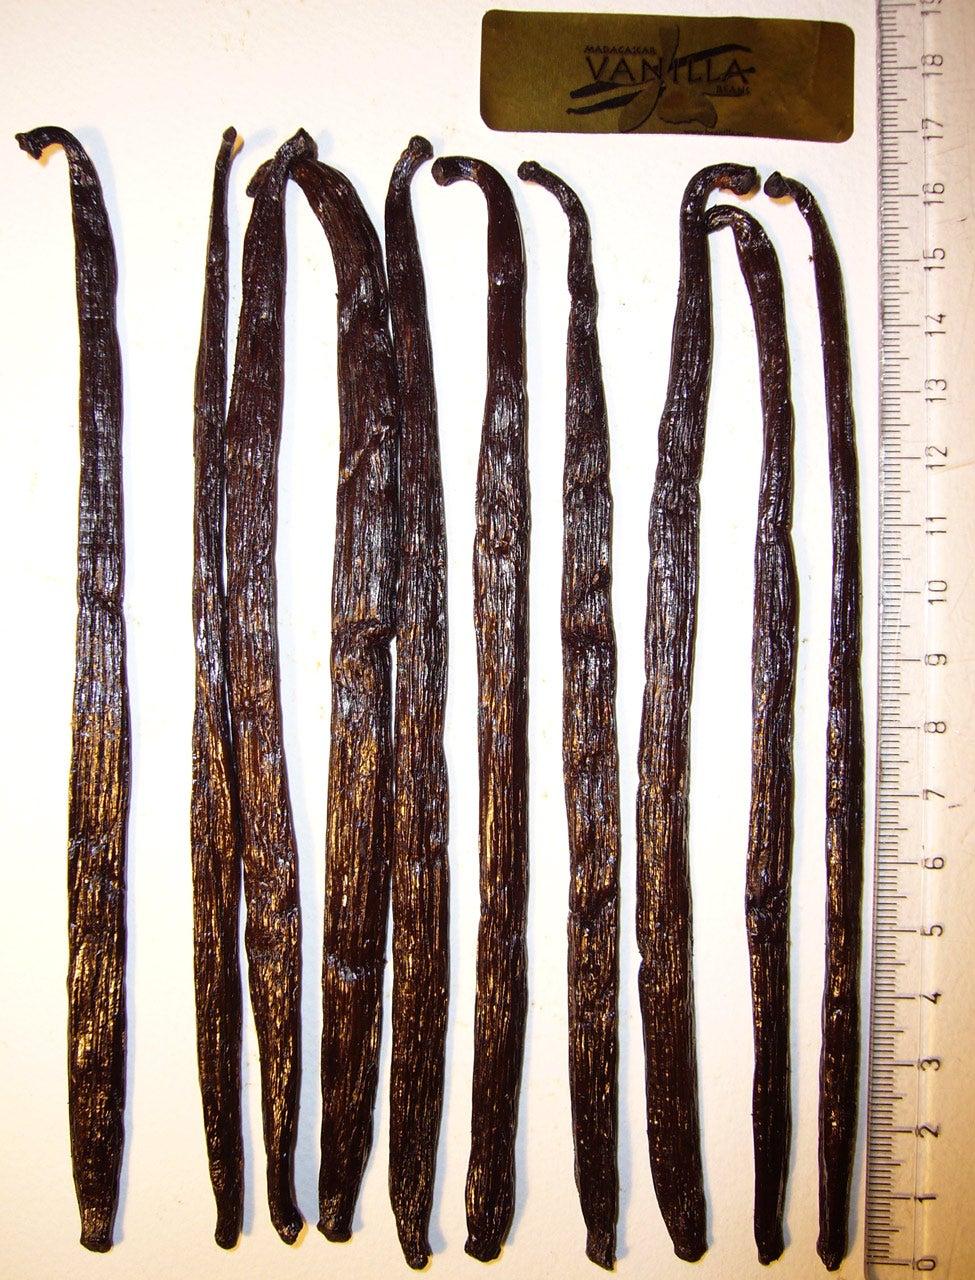 Madagascar Planifolia Comparison